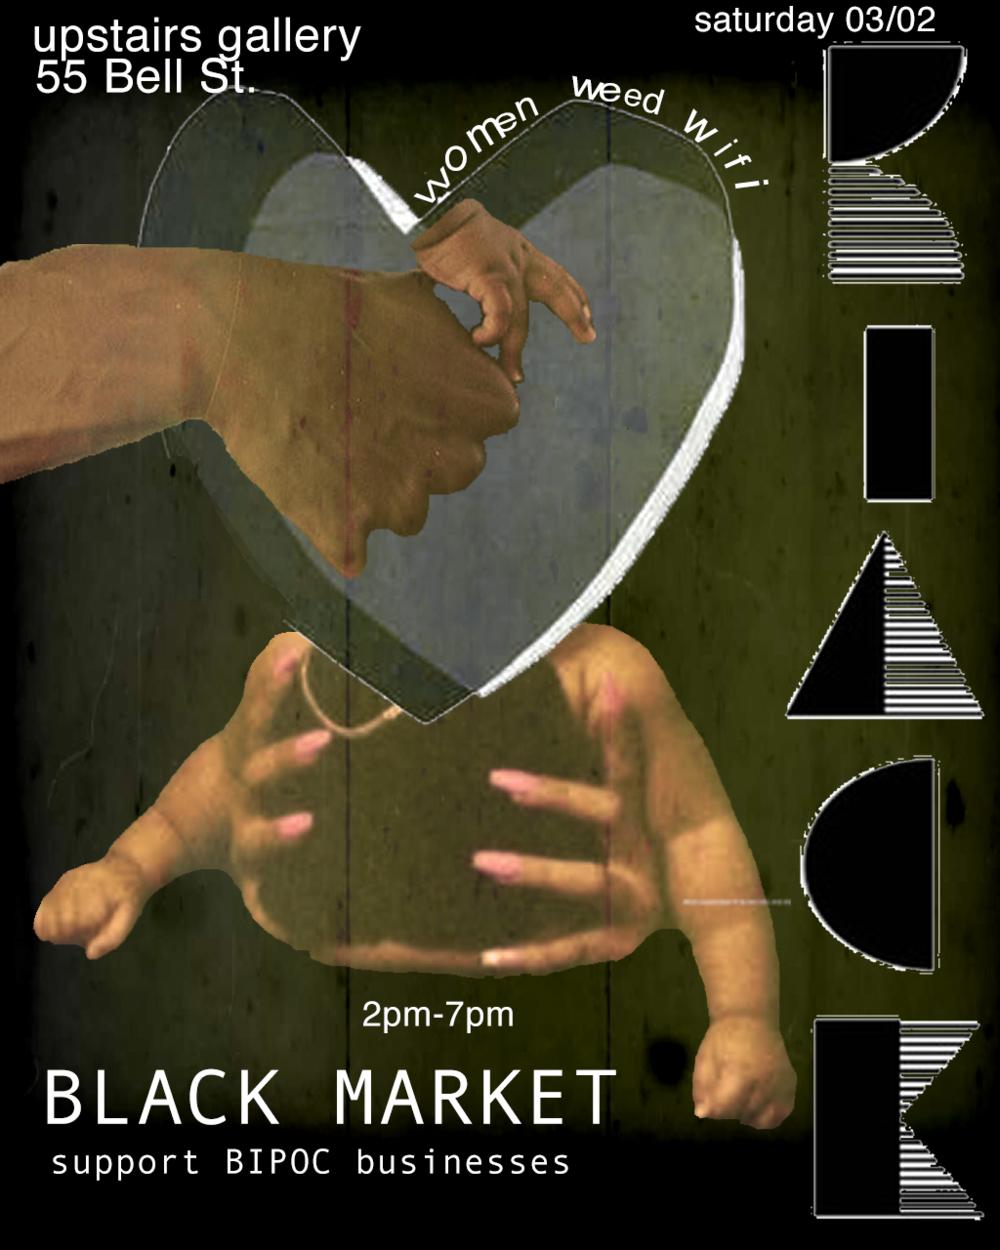 blackmarket0302.png